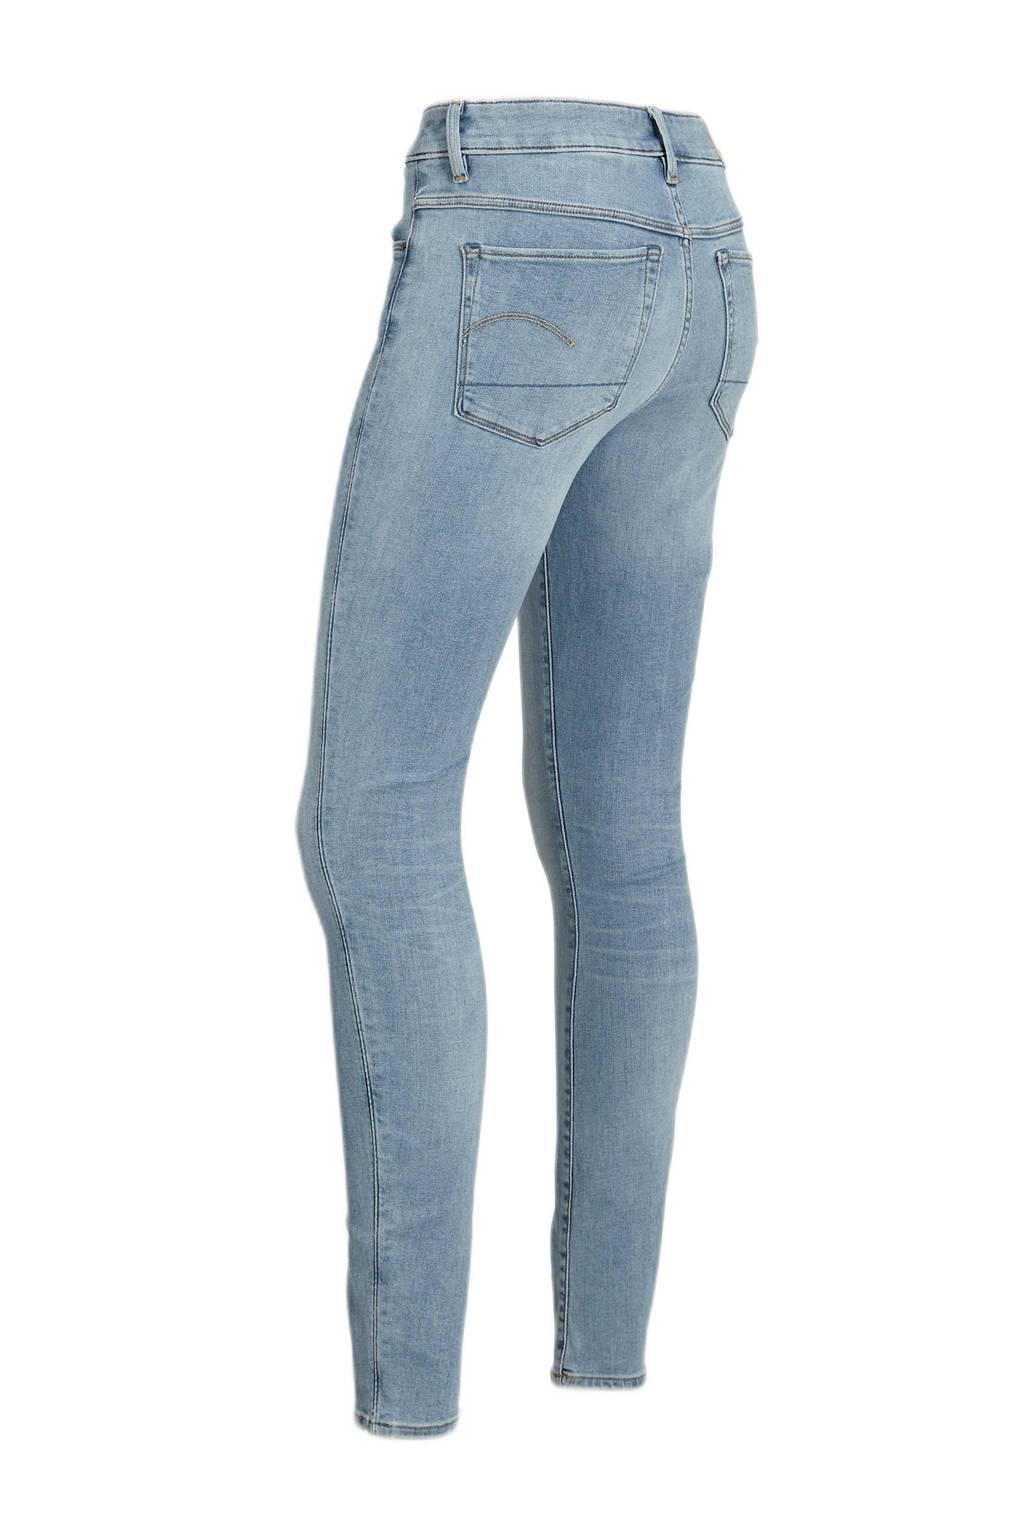 G-Star RAW 3301 high waist skinny jeans indigo aged, Indigo aged